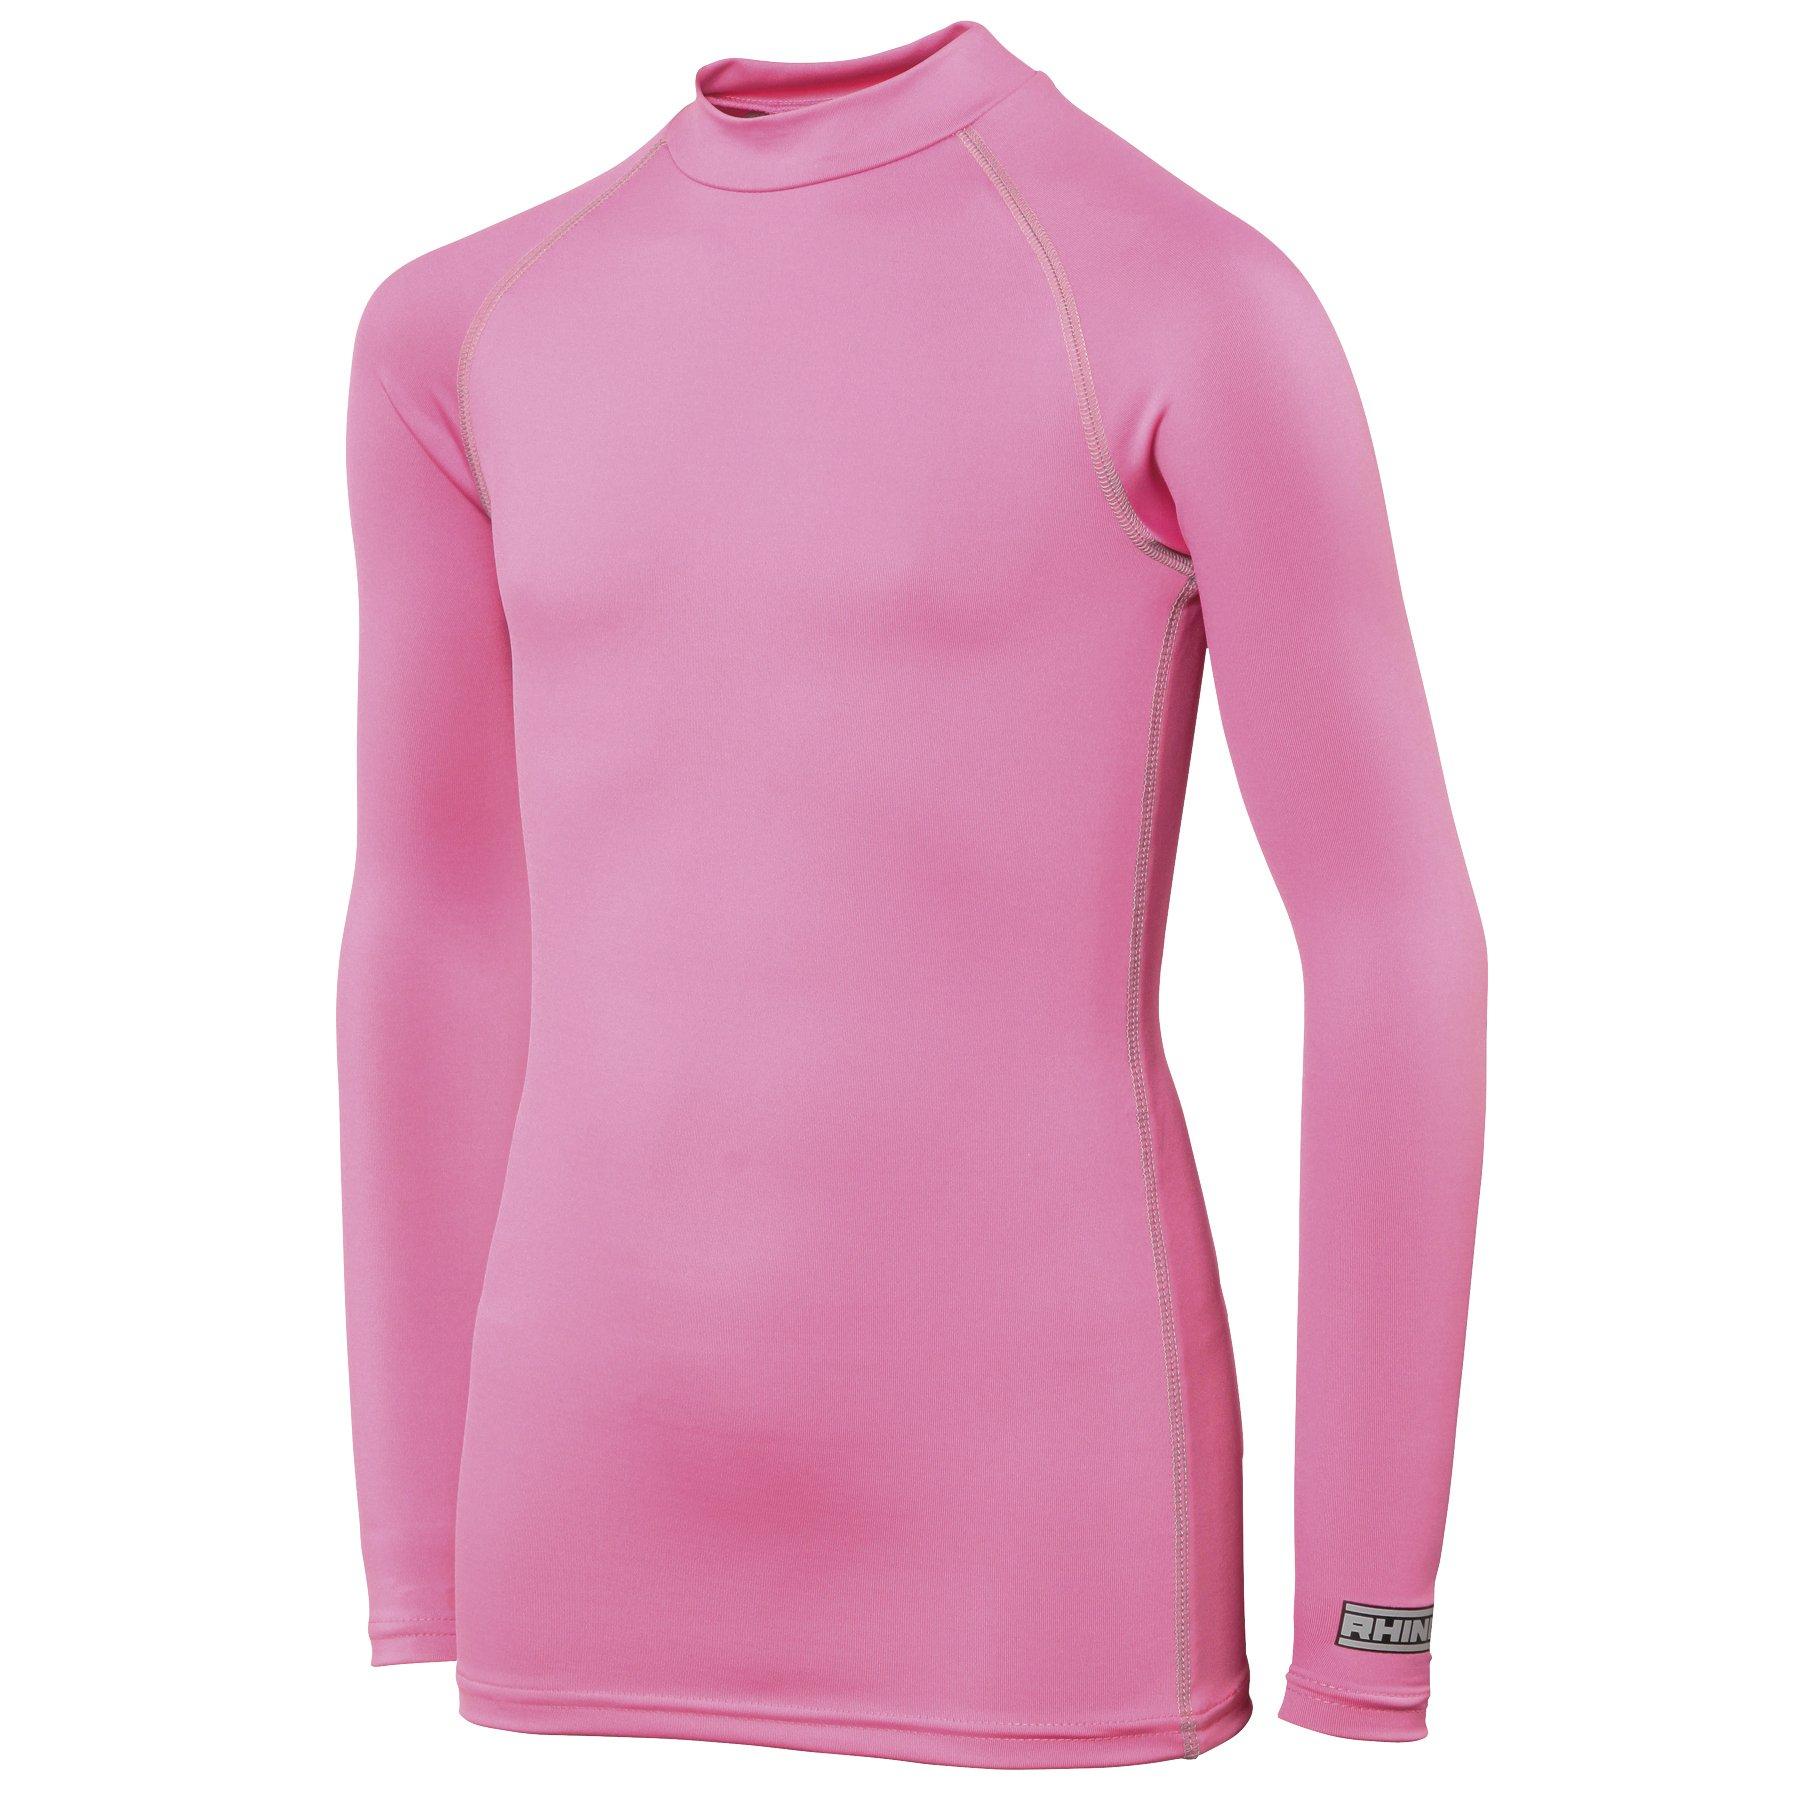 Rhino Childrens Big Boys Long Sleeve Thermal Underwear Base Layer Vest Top (XSY) (Pink) by Rhino